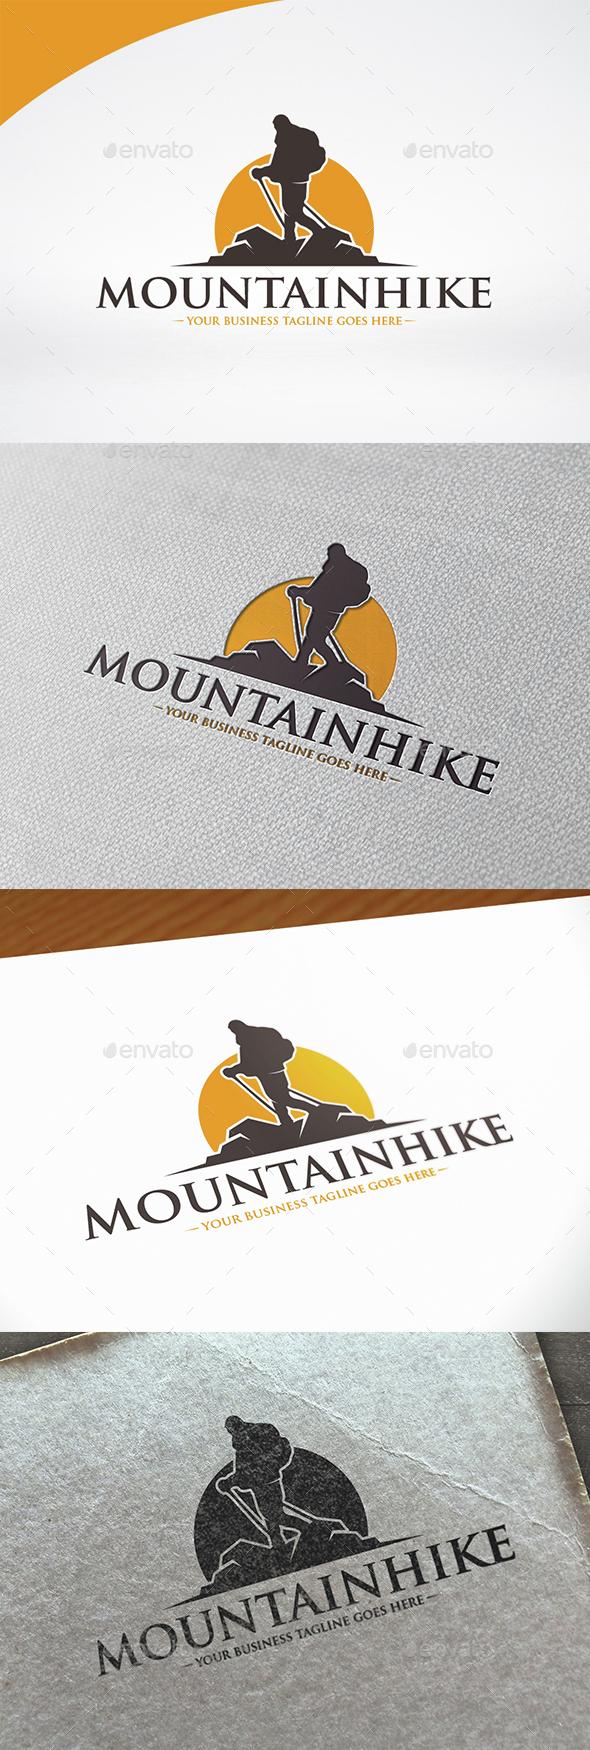 Mountain Hike Logo Template - Nature Logo Templates